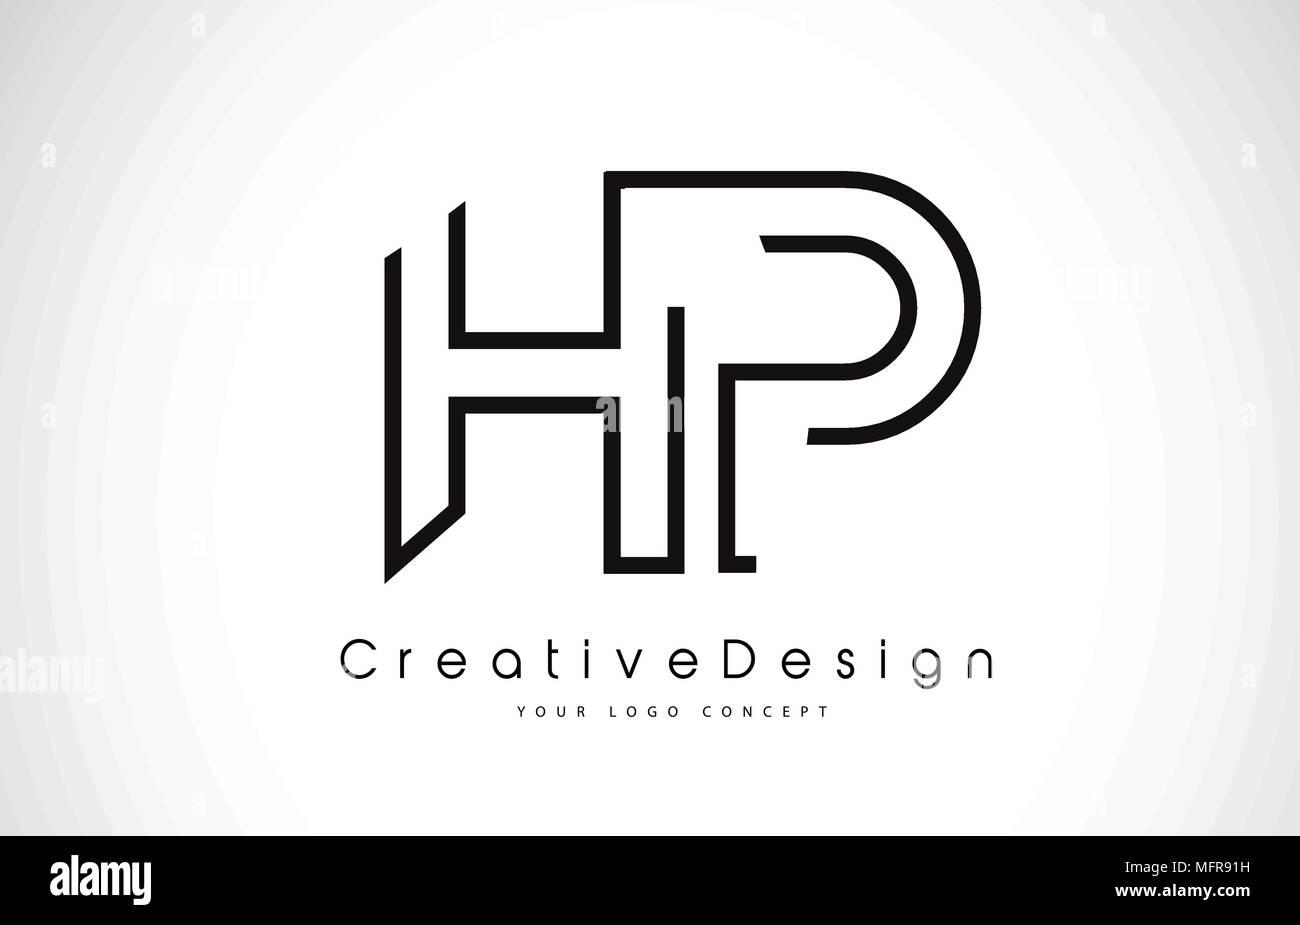 hp h p letter logo design in black colors creative modern letters